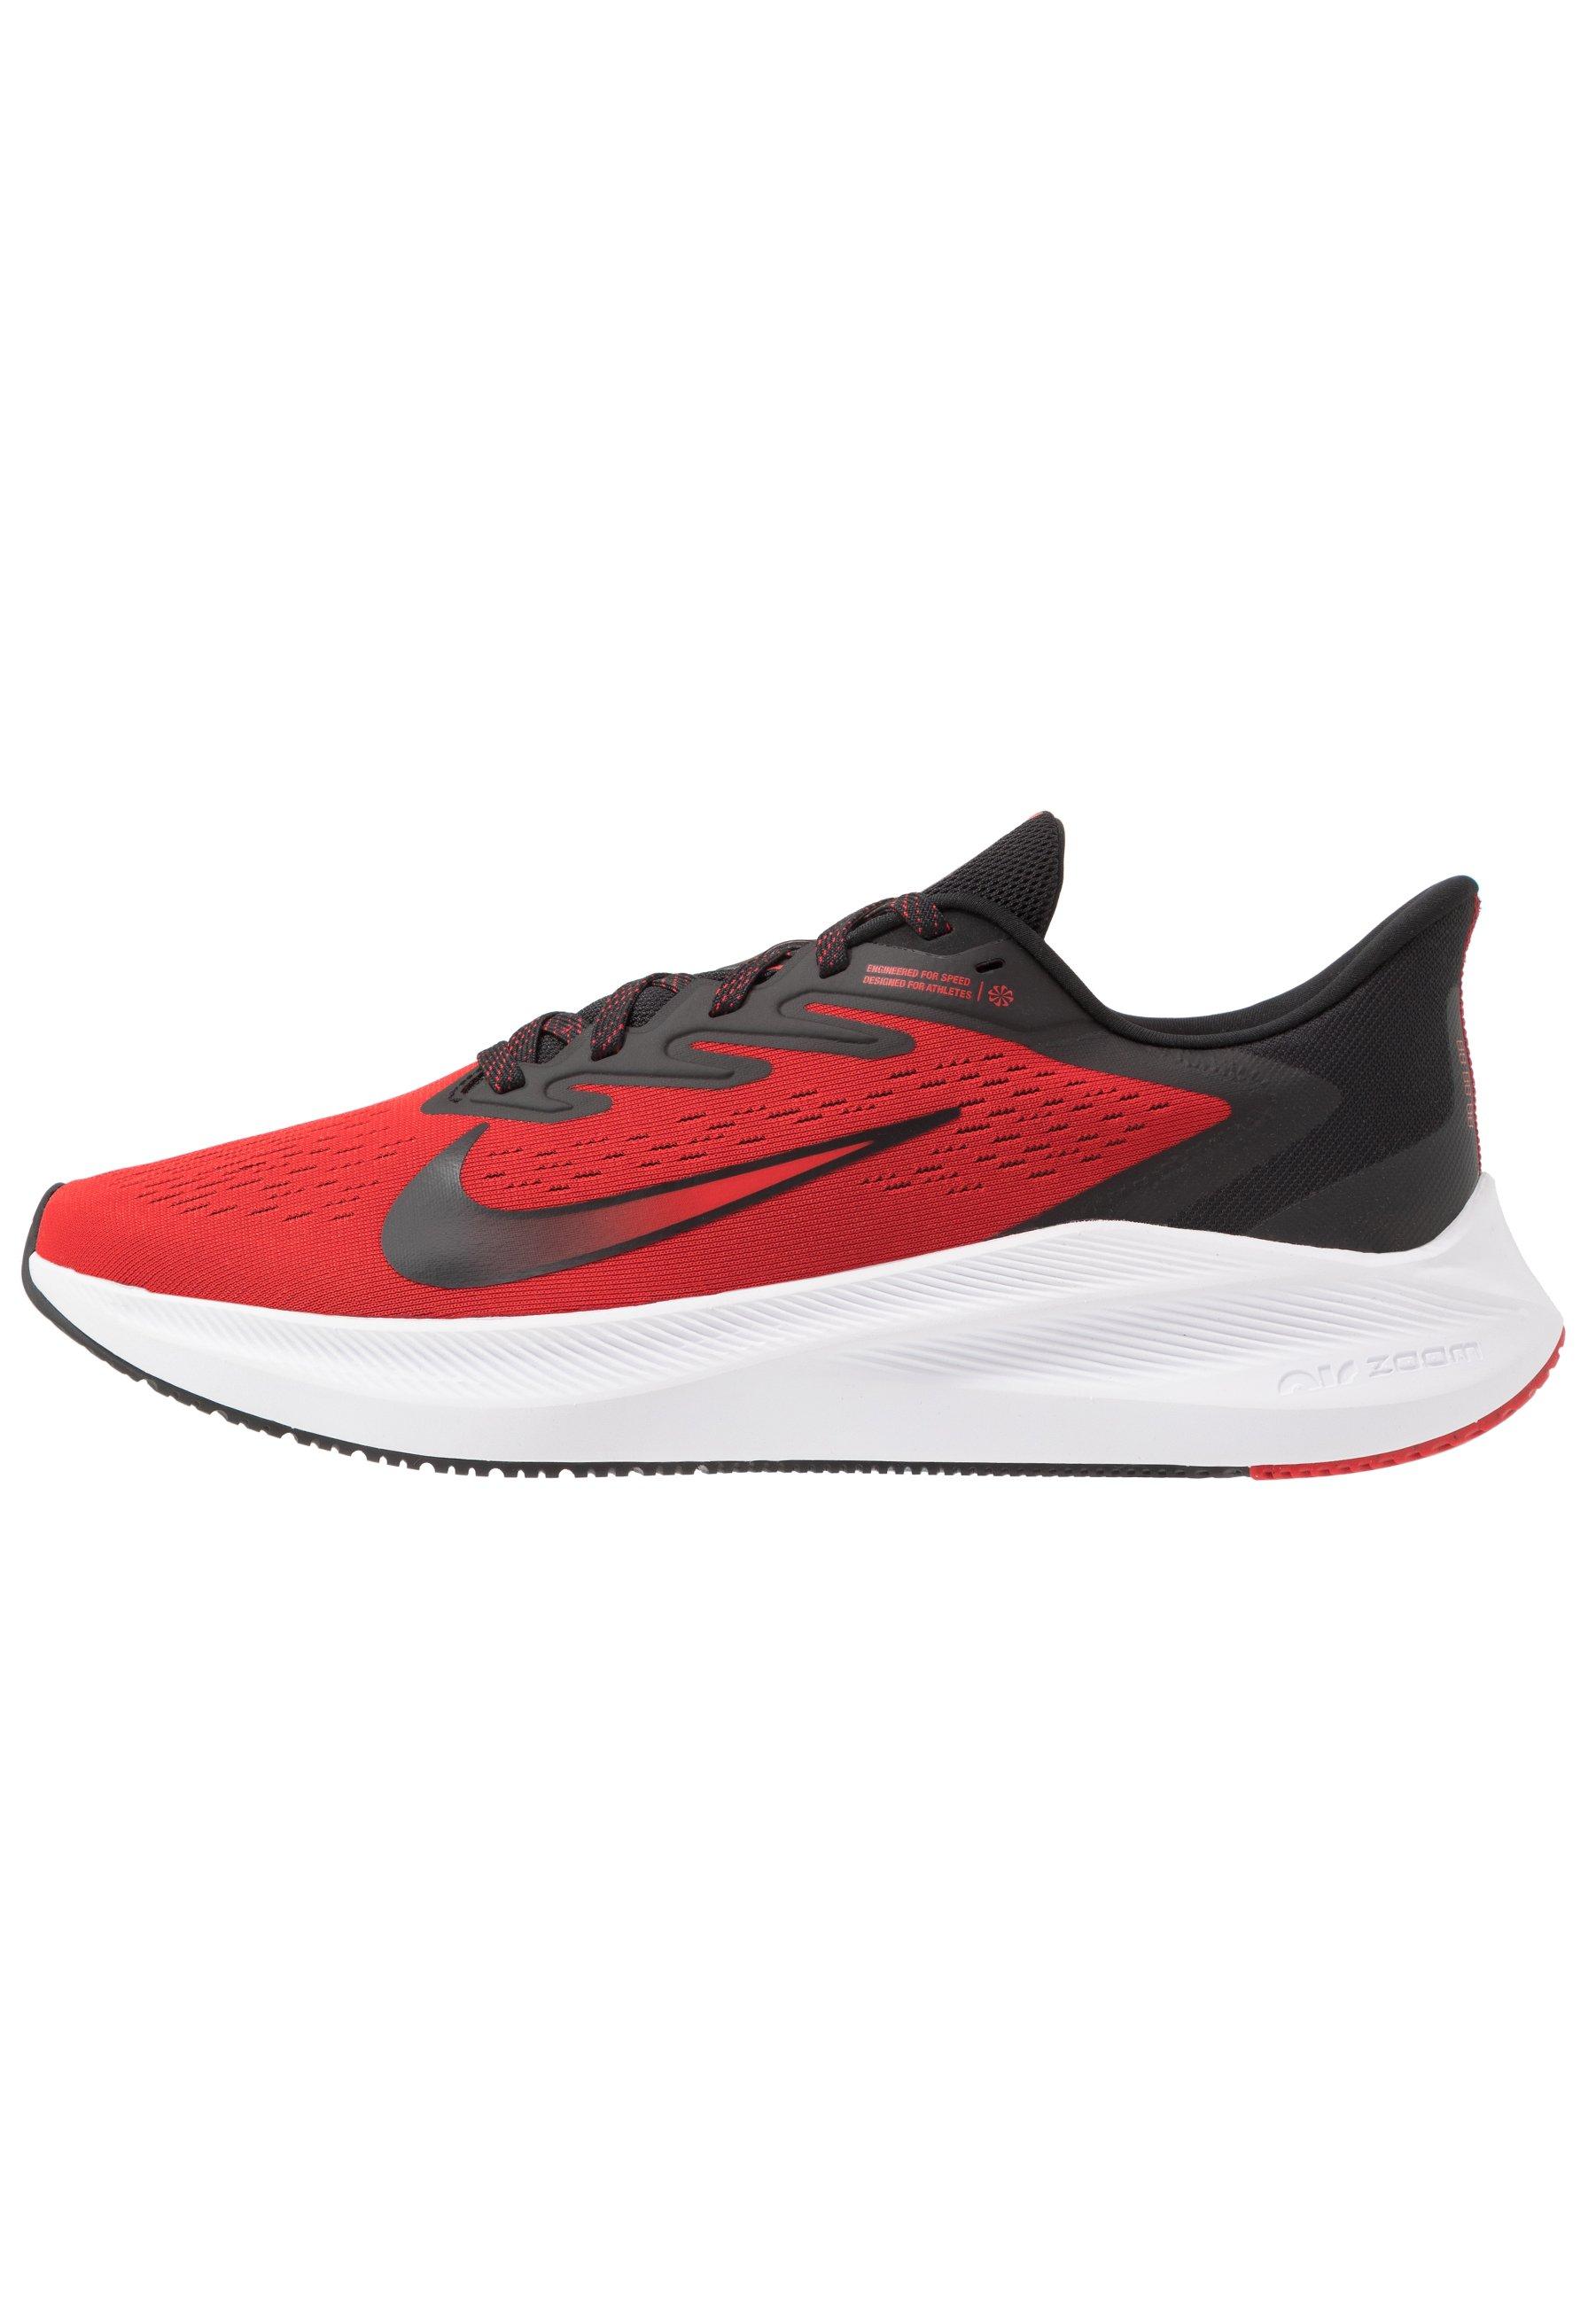 ZOOM WINFLO 7 Chaussures de running neutres university redblackwhite